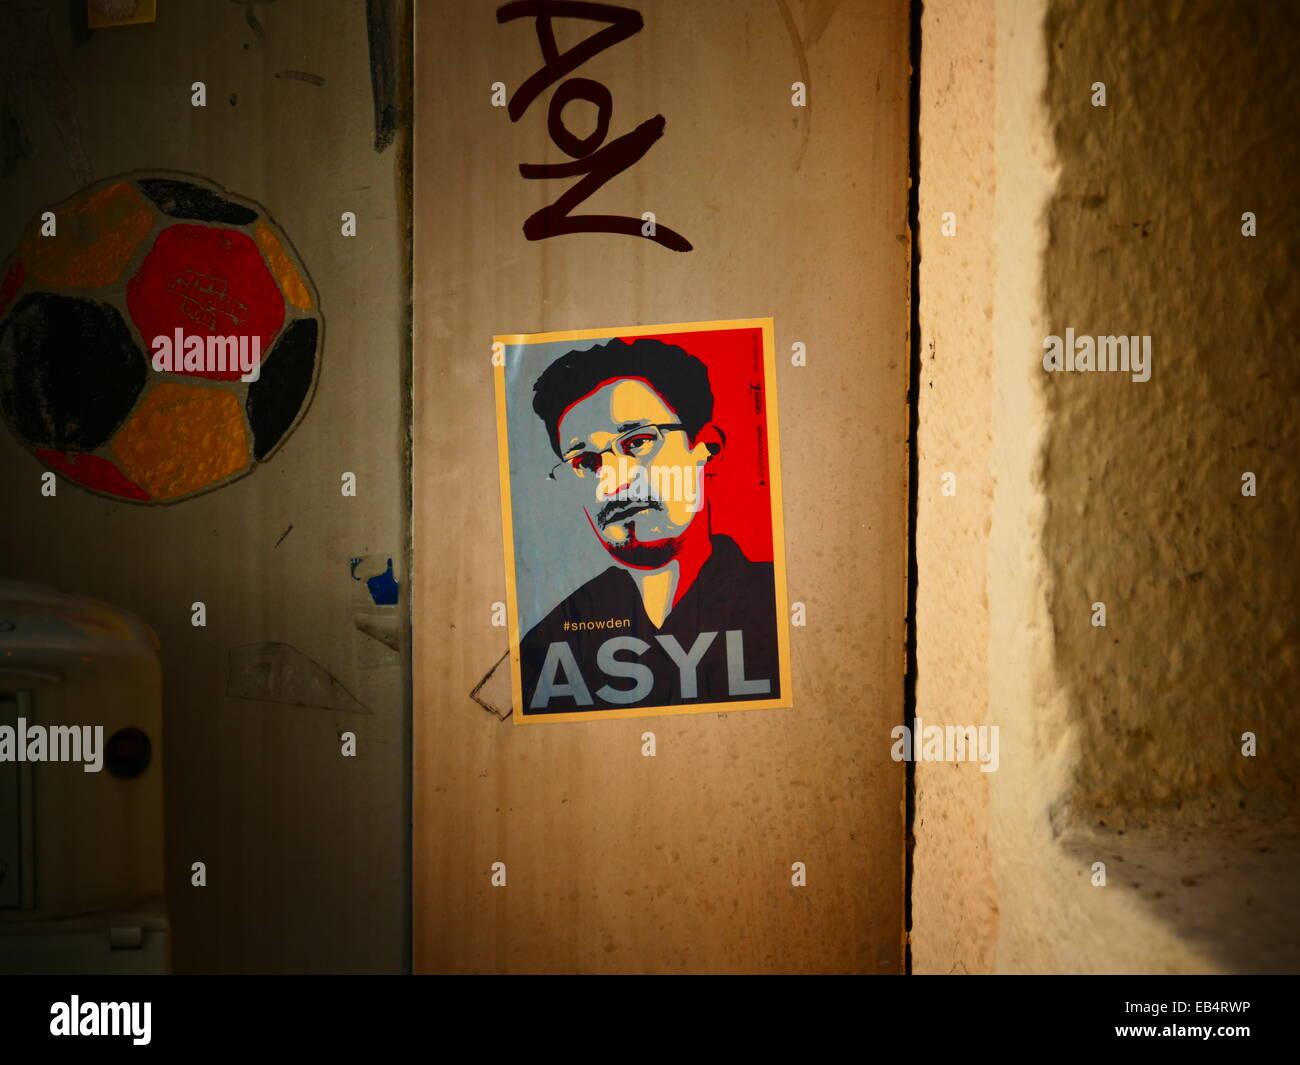 Whistle Blower Edward Snowdon Asyl label - Stock Image